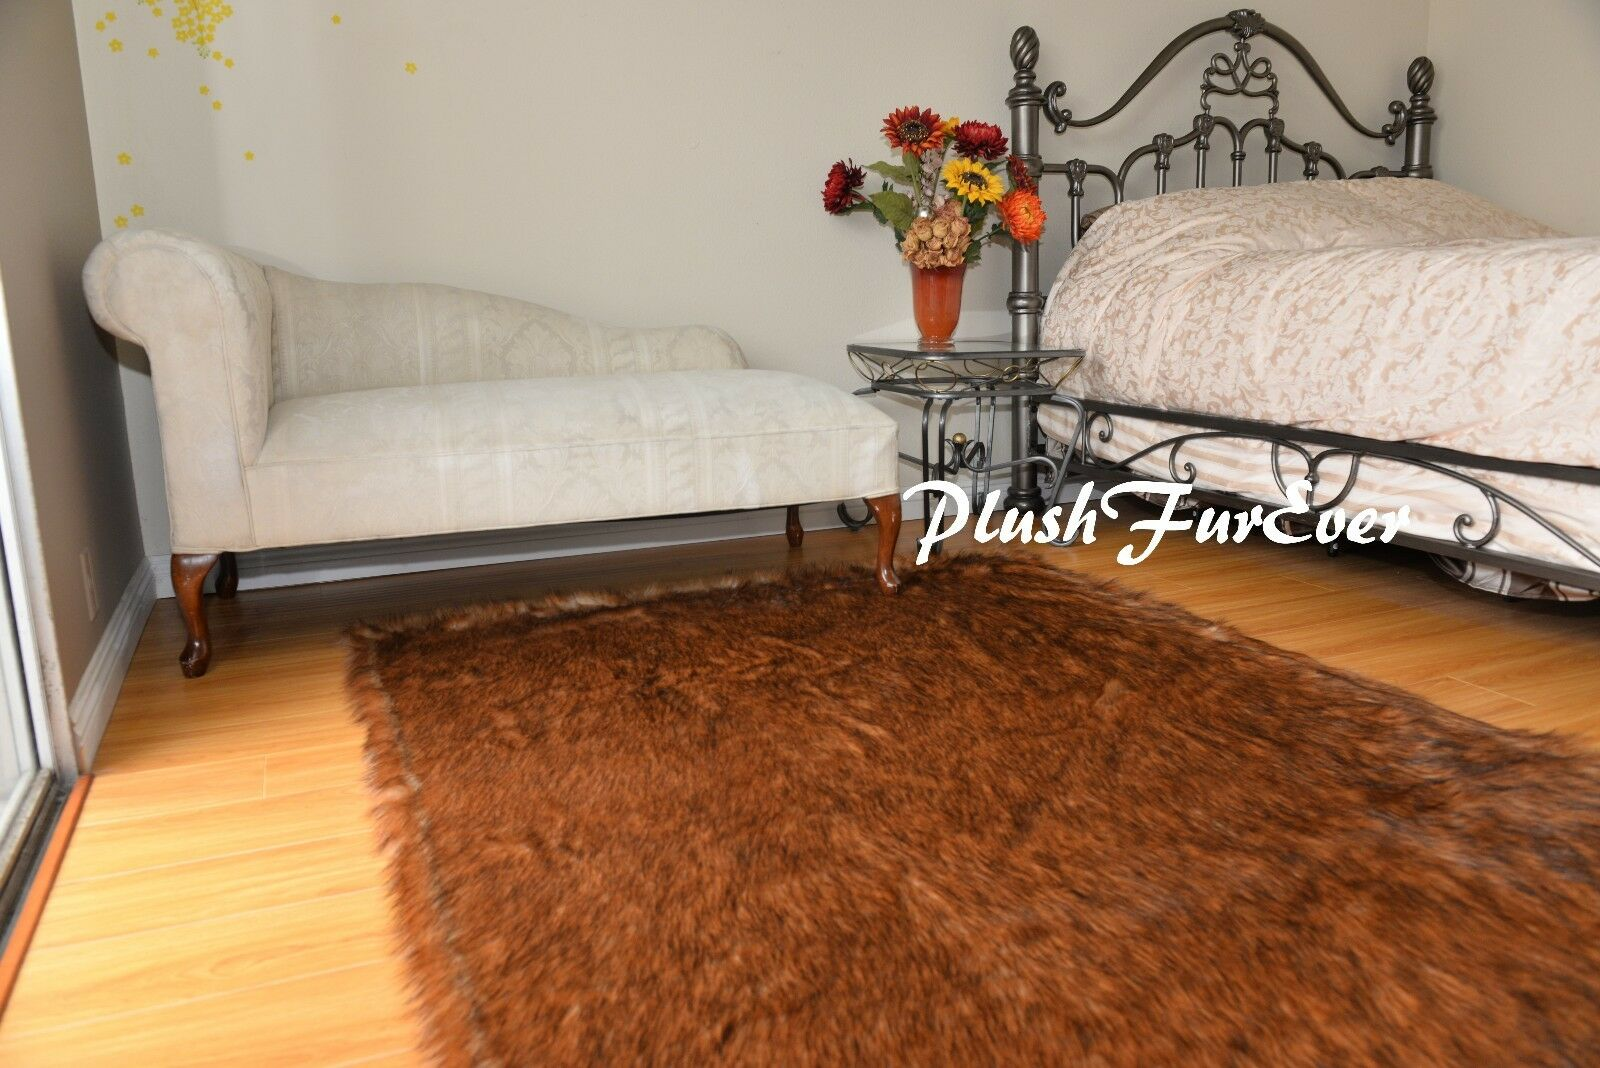 Grizzle Bearskin Rectangle Plush Plush Plush Area Rug Faux Fur Lodge Home Decors Shaggy Furs b4eae1